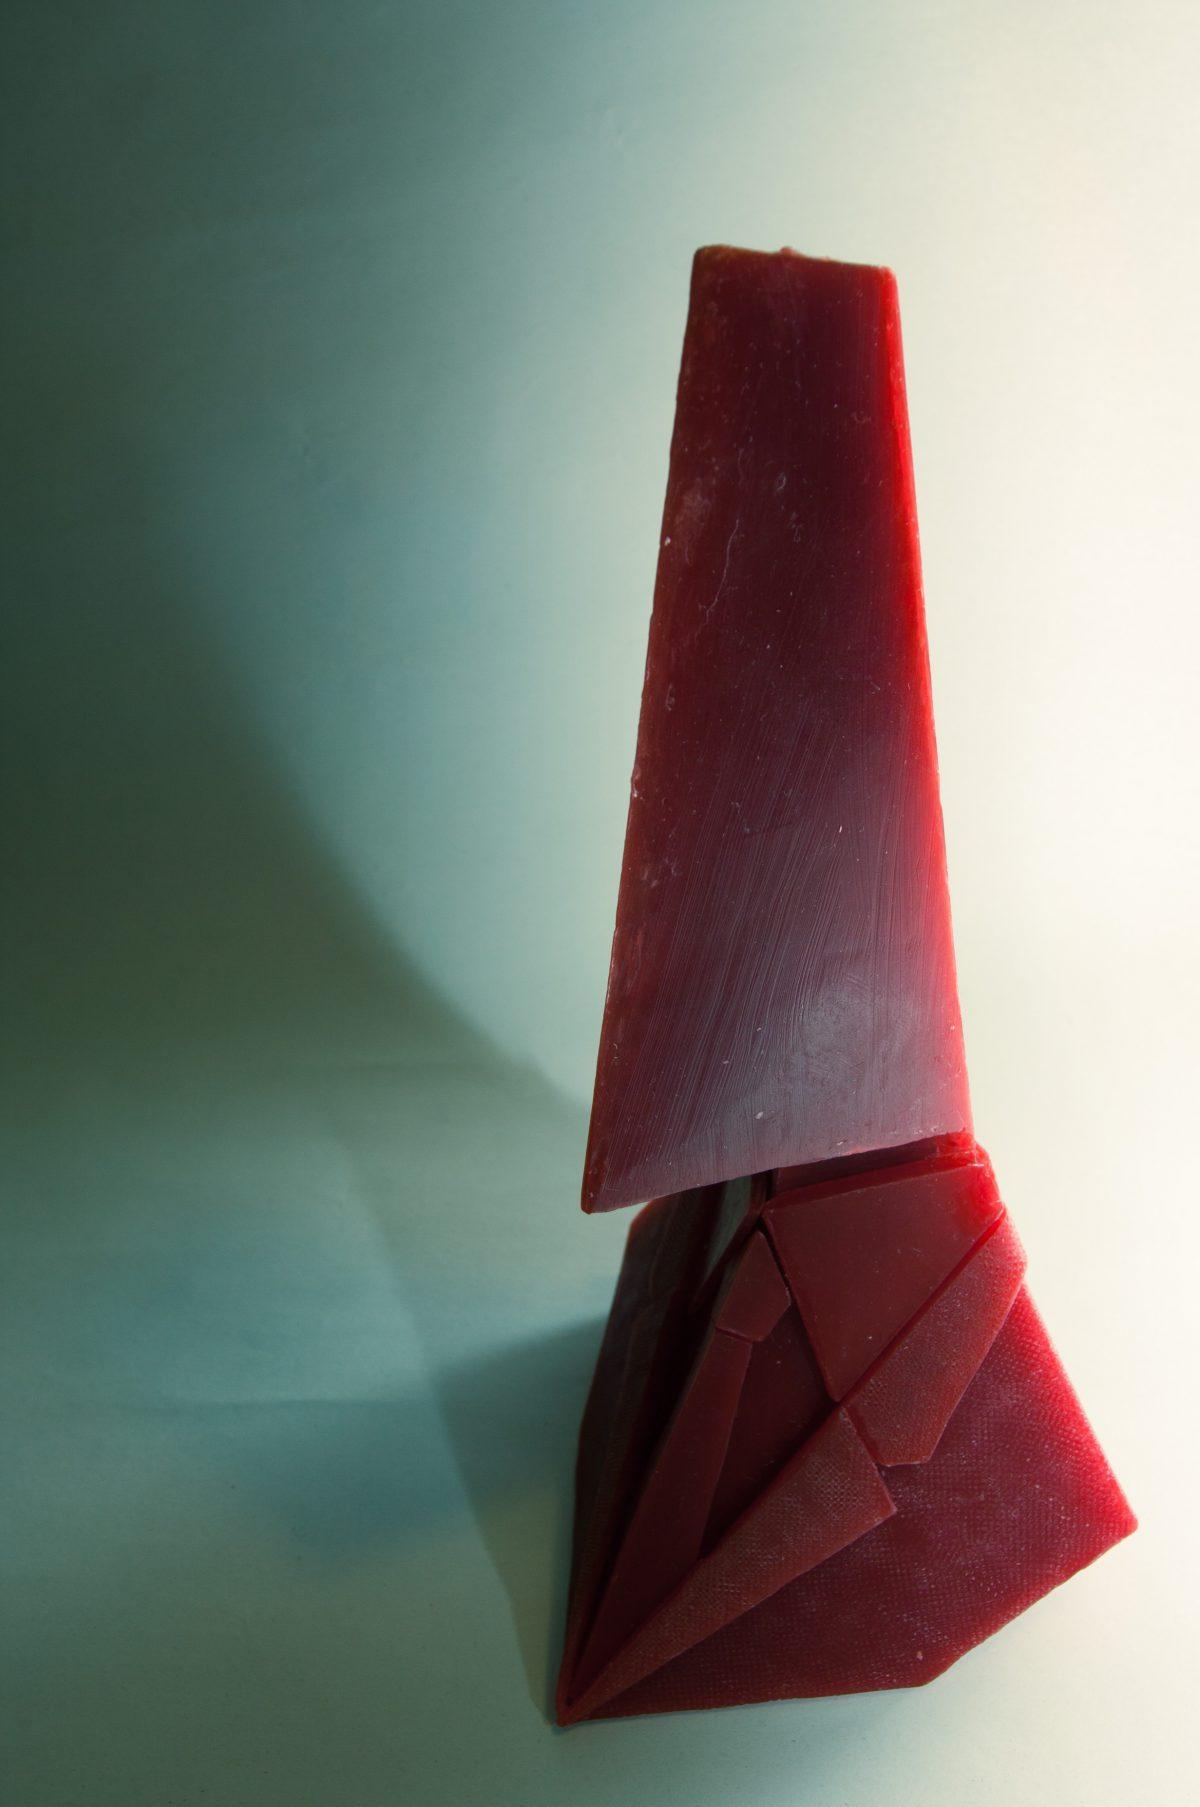 bust - 24cm wax, for casting, ch3, sculpture, wax, colorGrade, bust